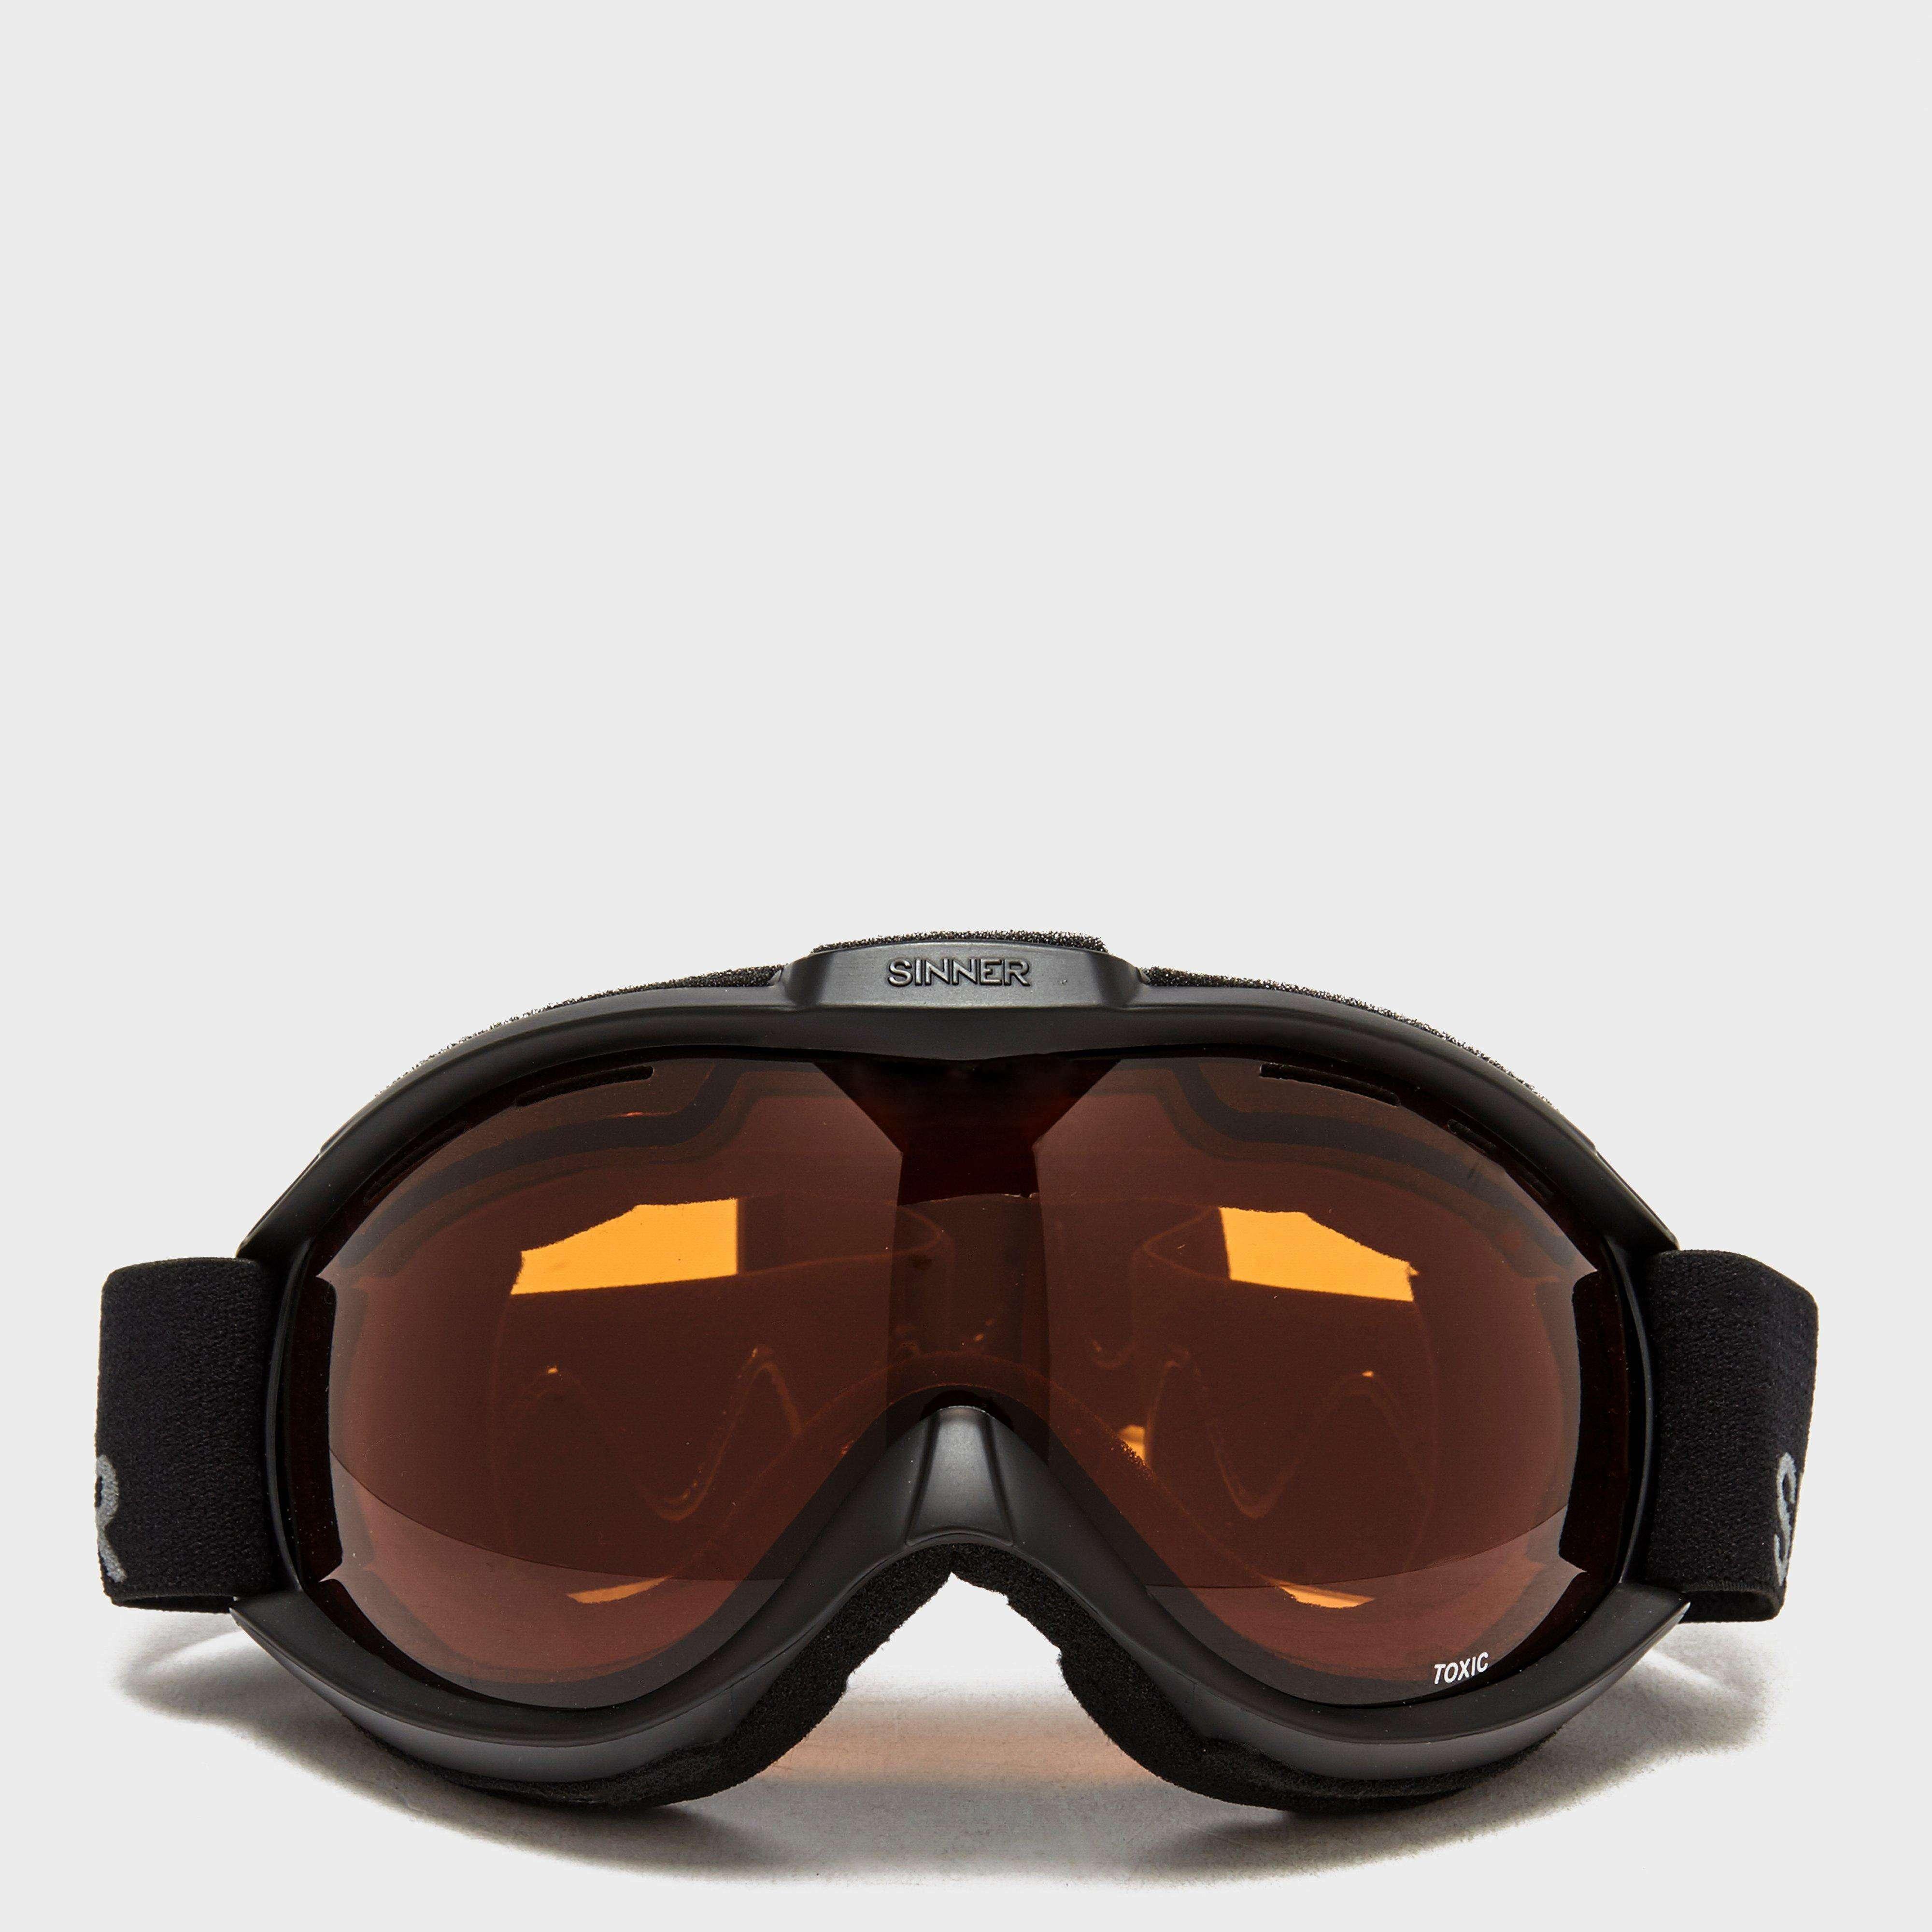 SINNER Toxic Ski Goggles